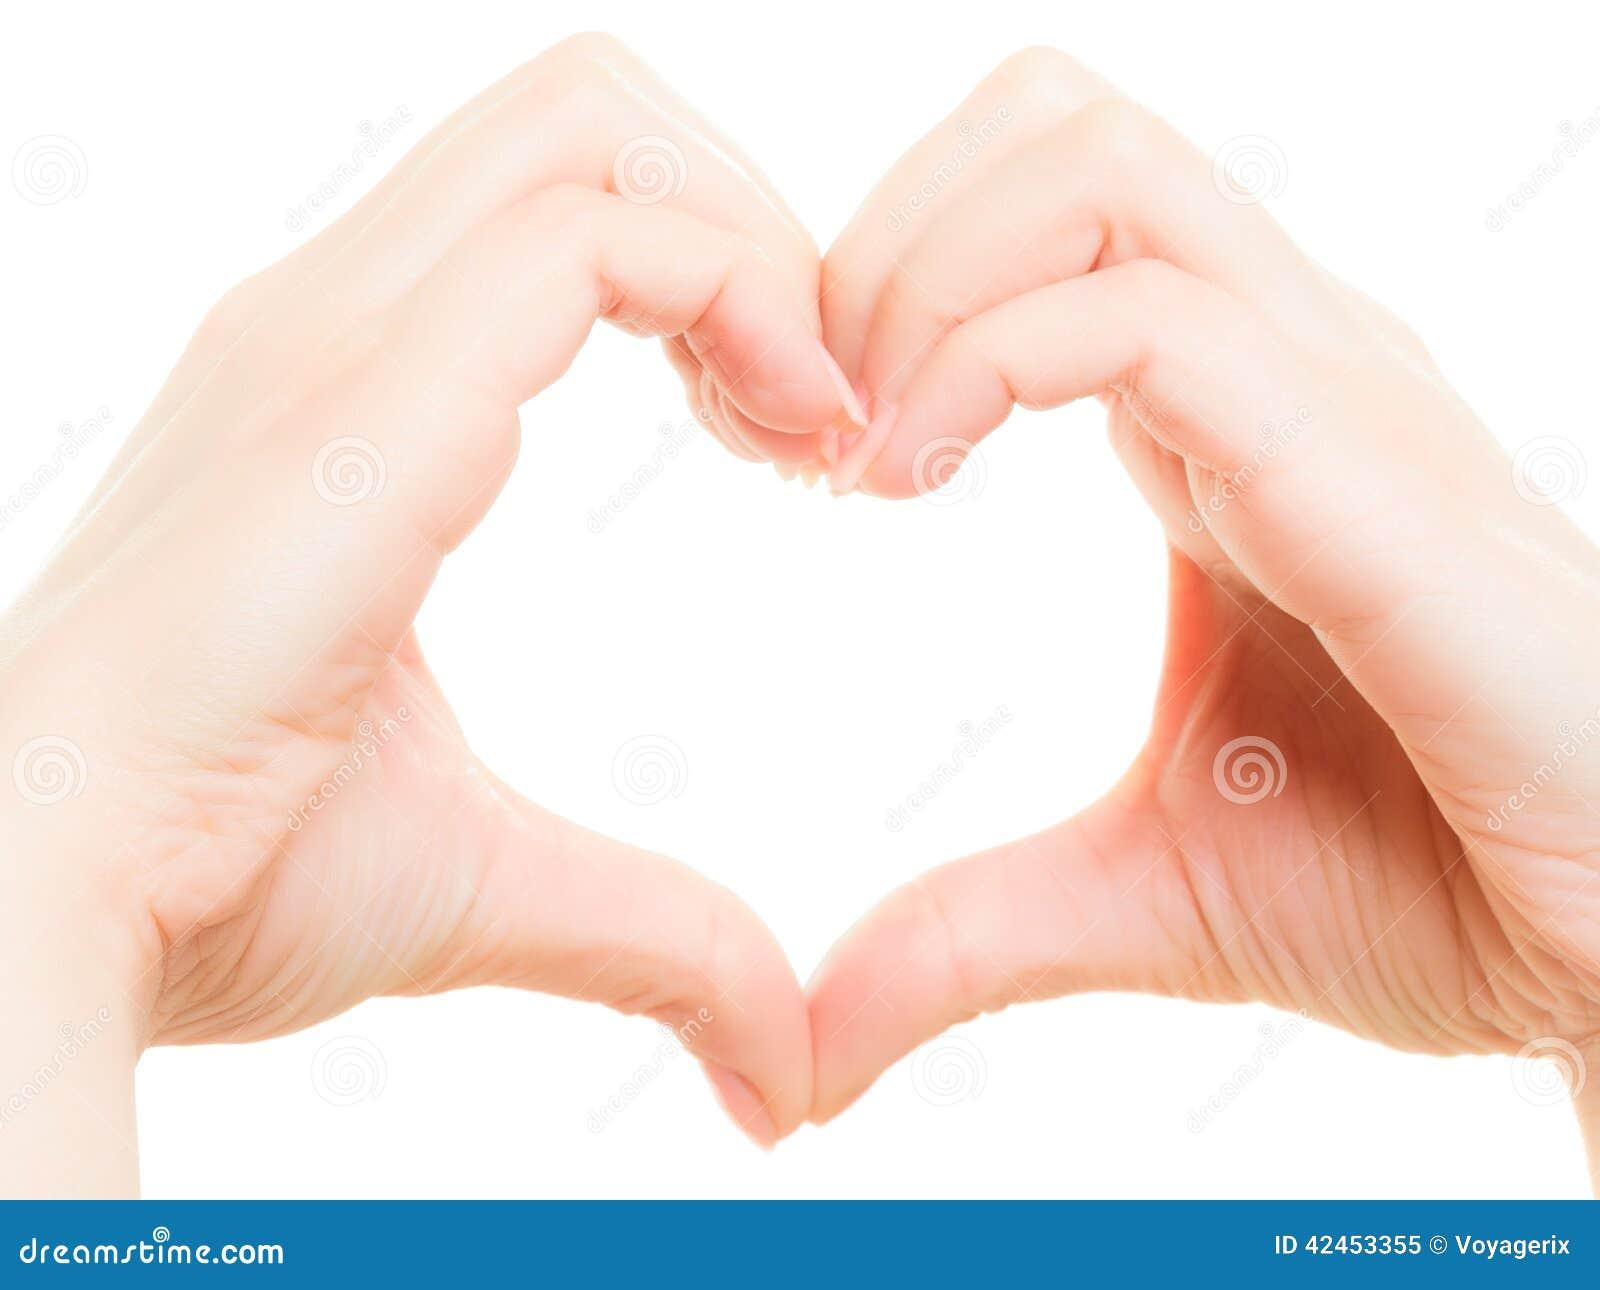 Female hands showing heart shape symbol of love